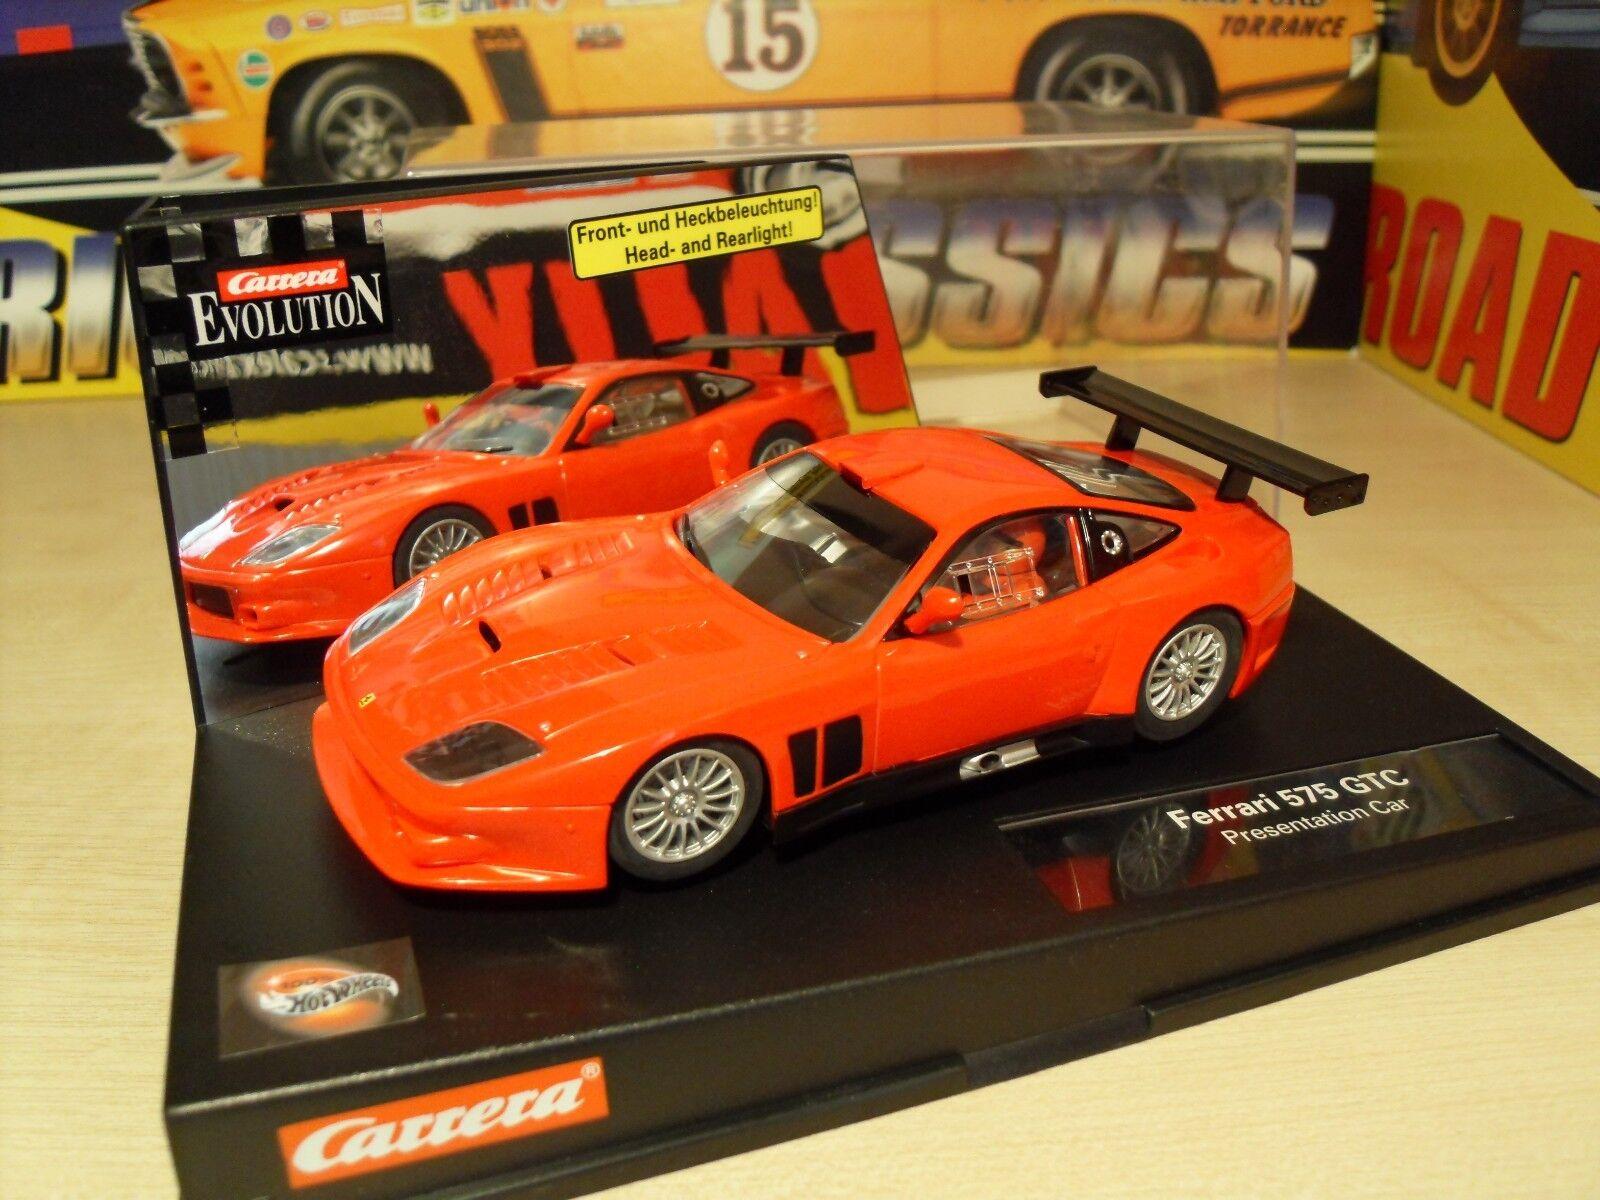 Carrera 25725 Ferrari 575 GTC - Brand New in Box.